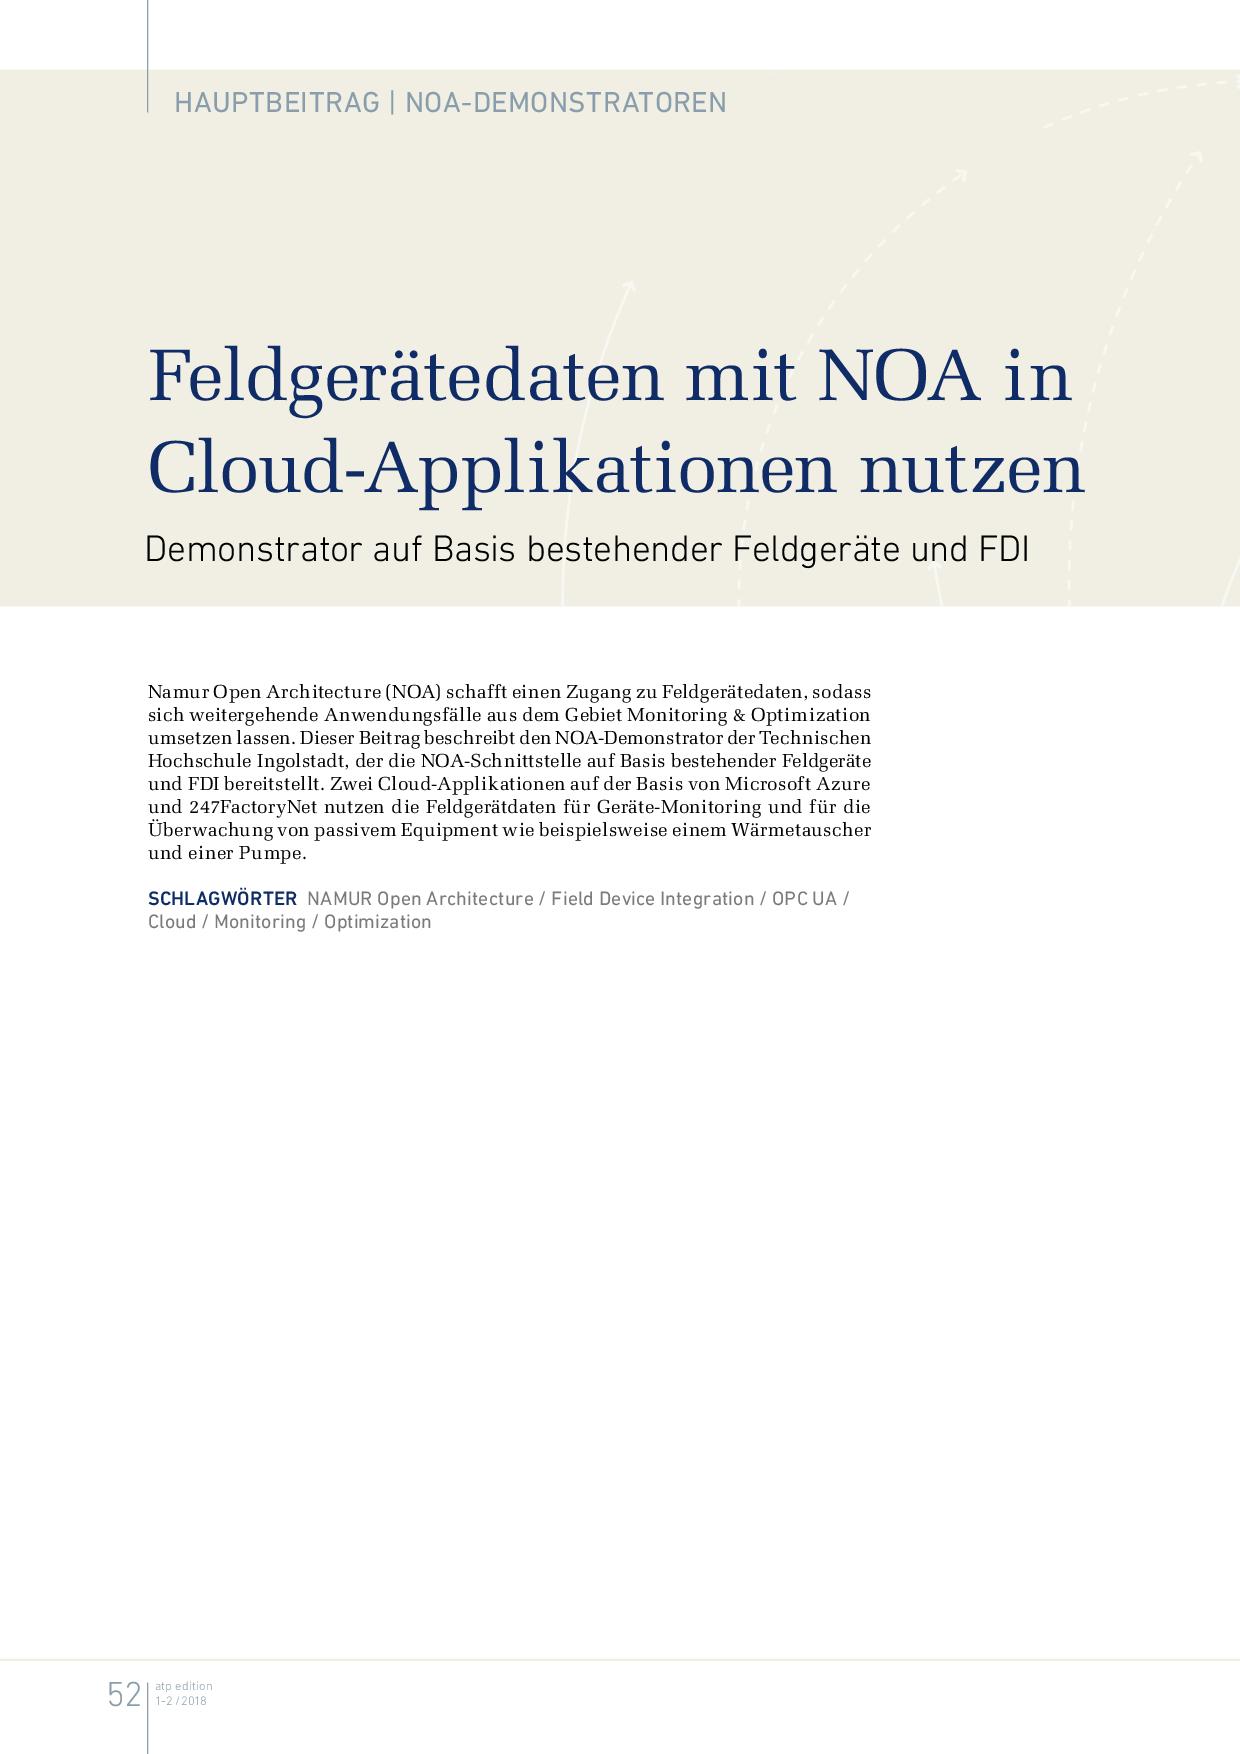 Feldgerätedaten mit NOA in Cloud-Applikationen nutzen